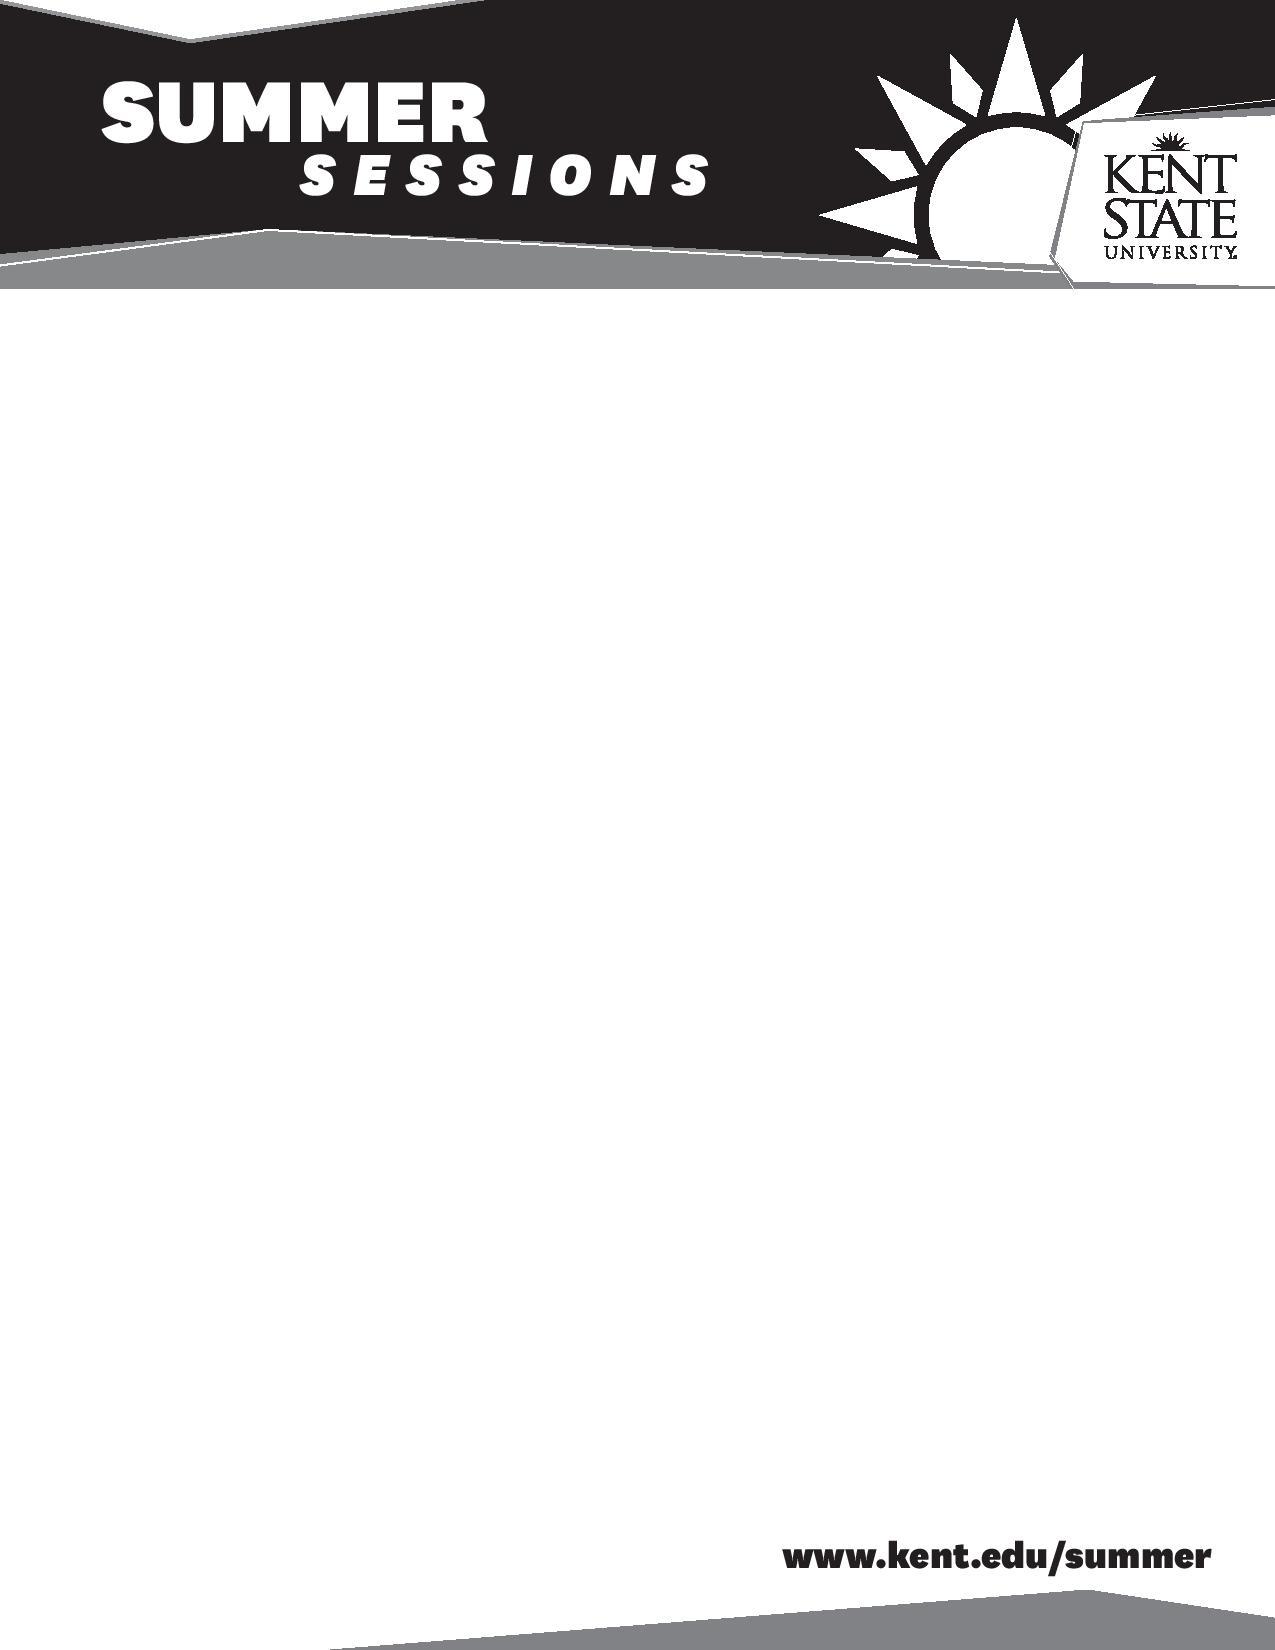 Summer 2020 Masthead Graphic 8.5x11 BW